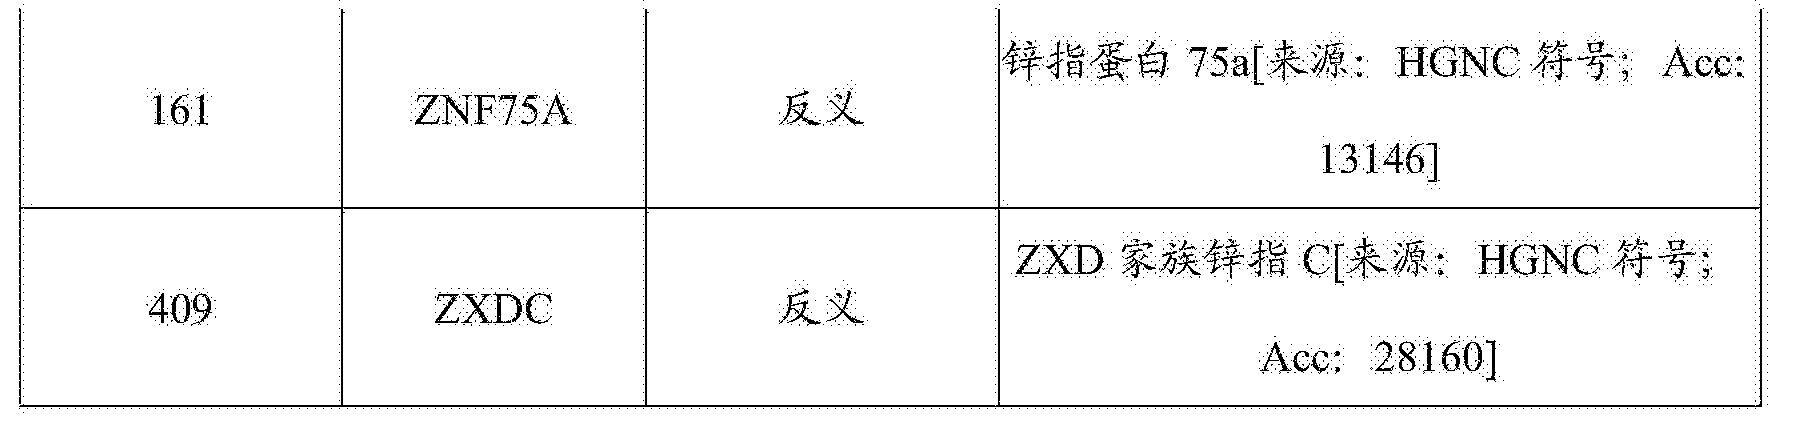 Figure CN103403543B9D00371